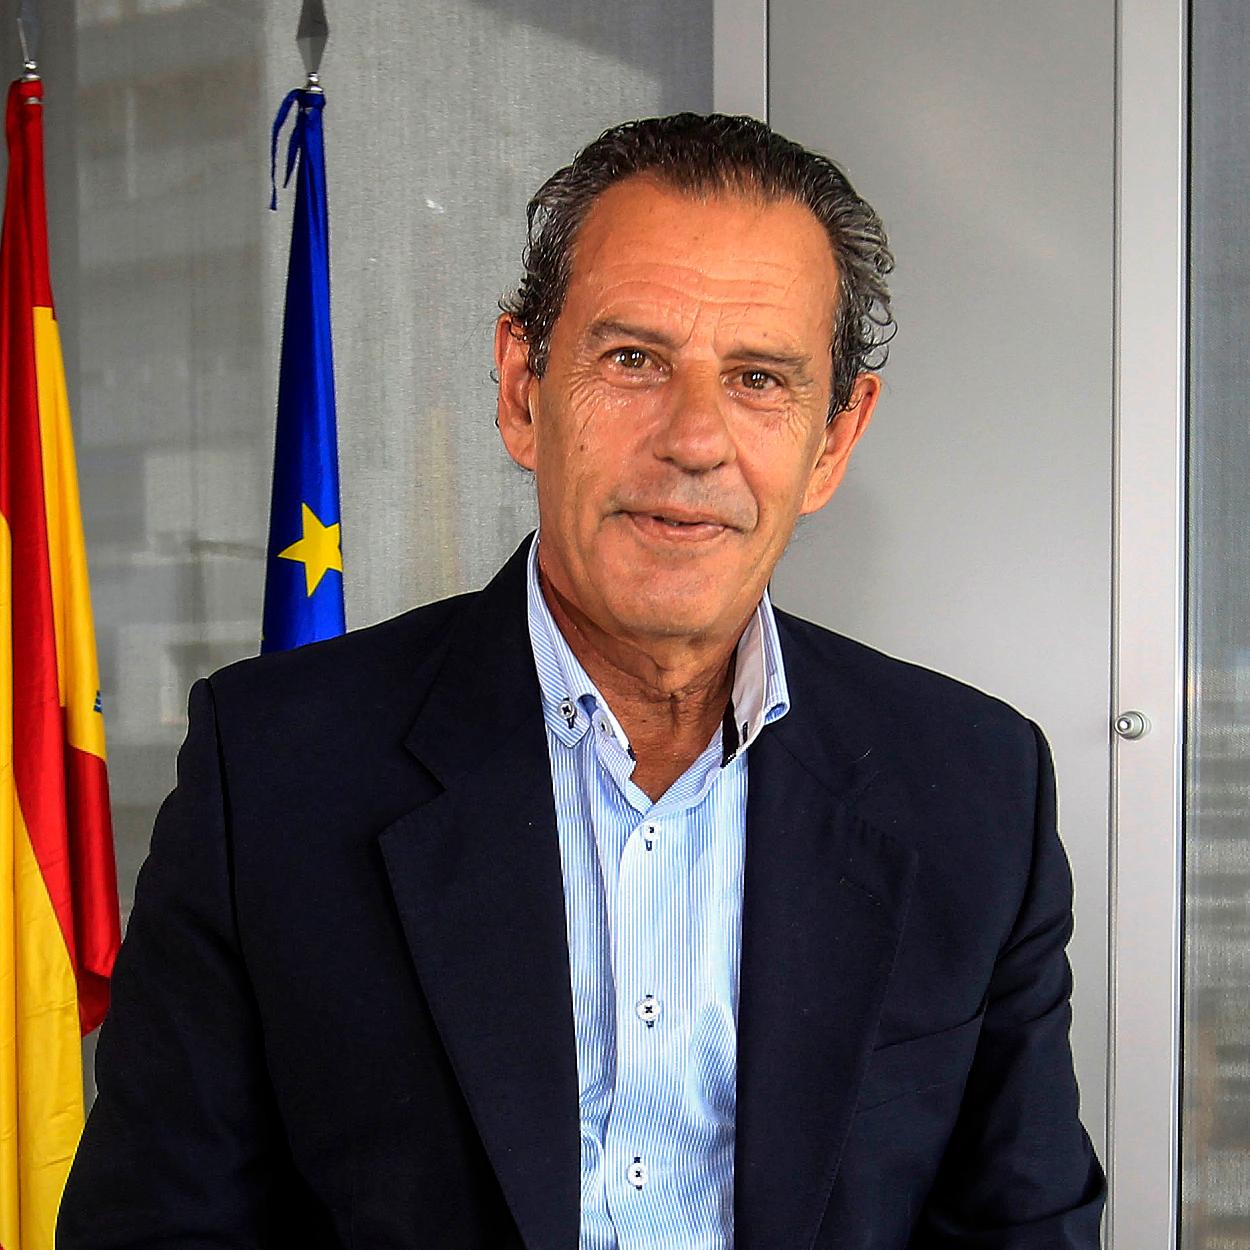 Rafael Merino López